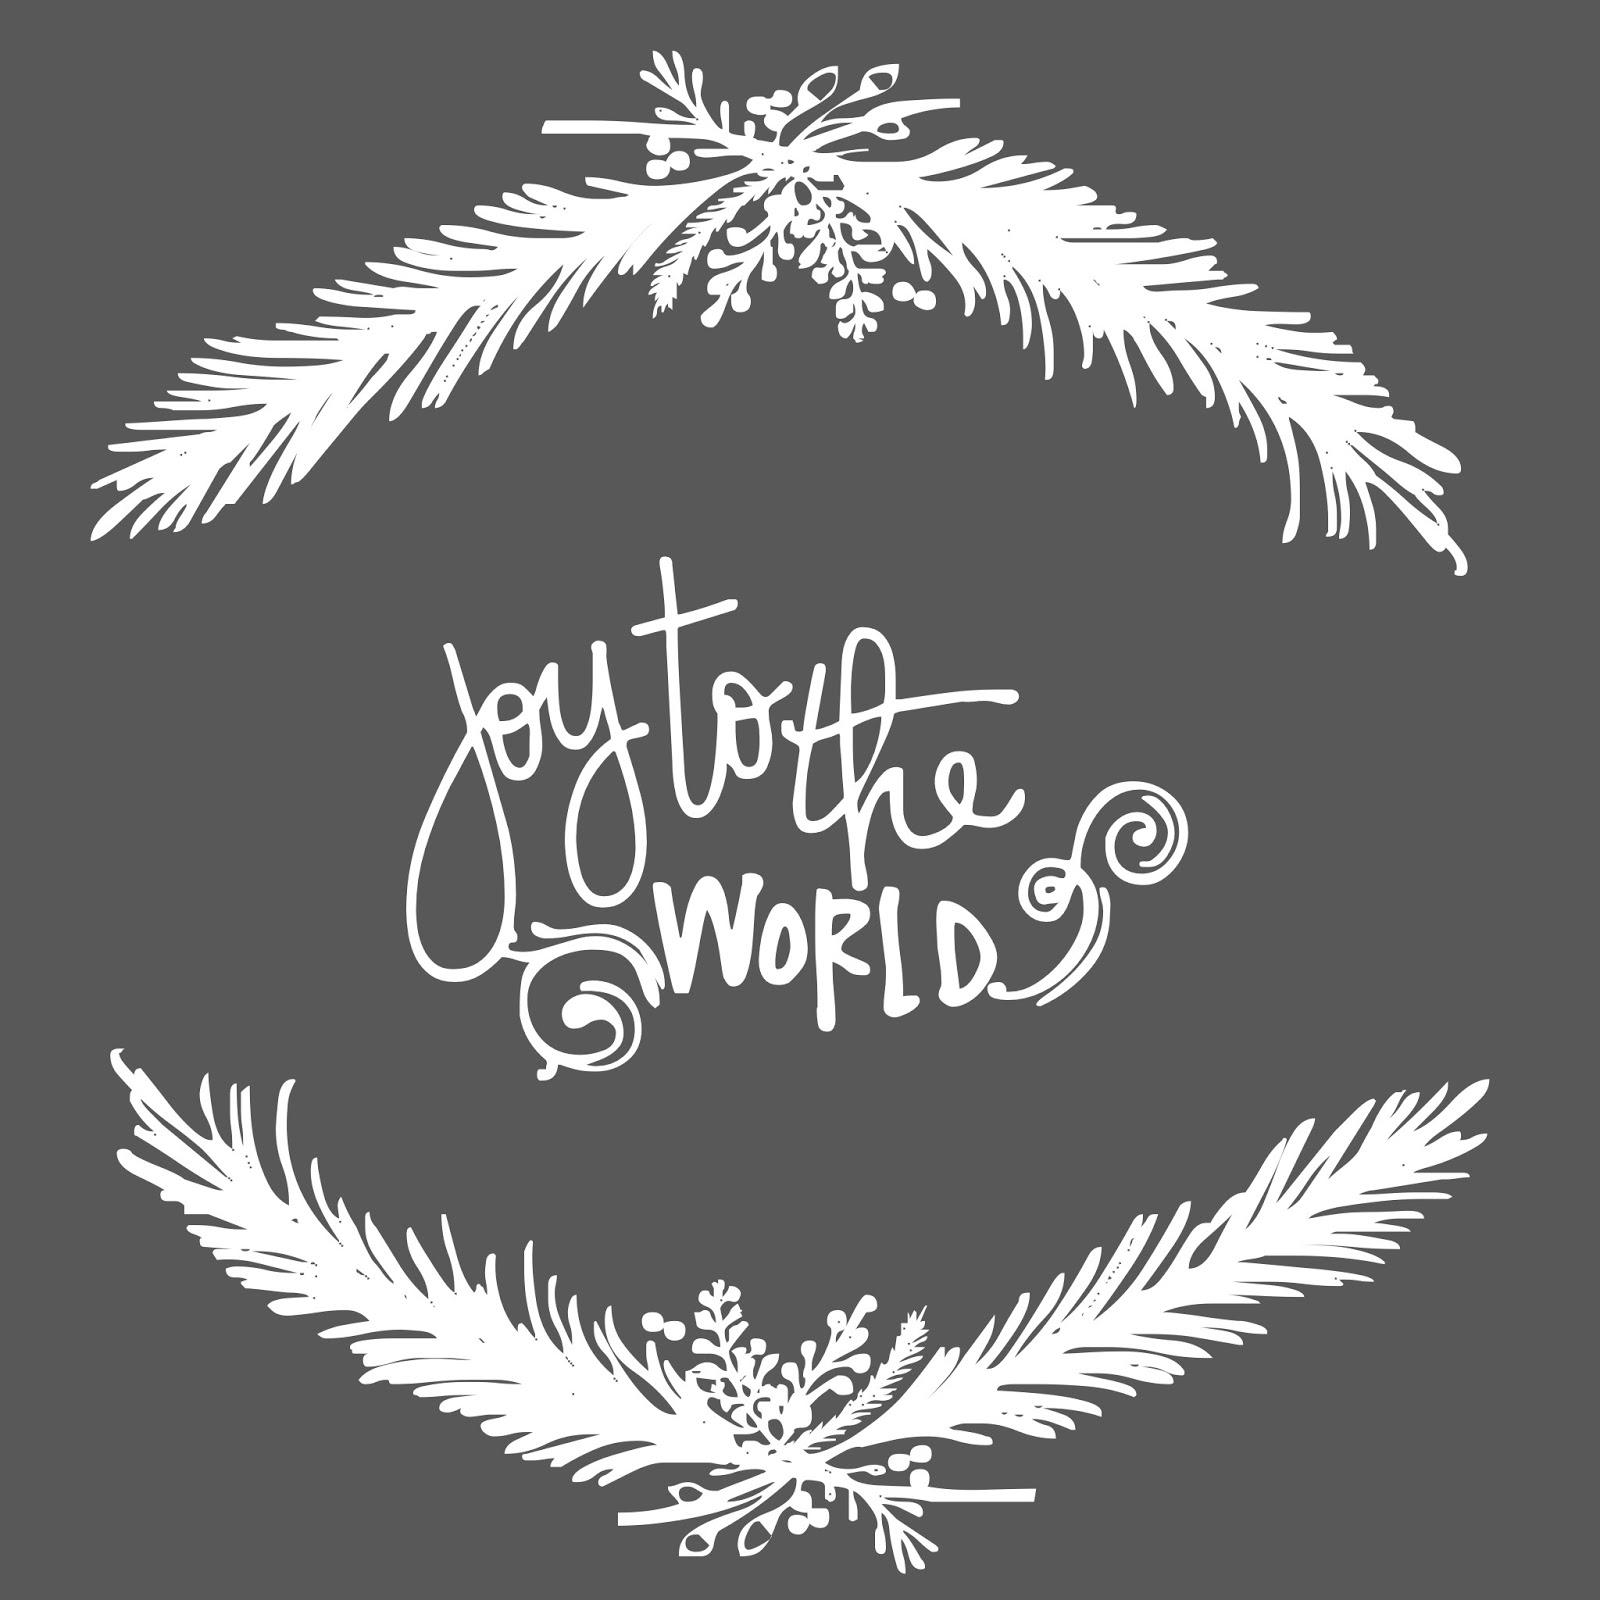 Joy to the World free Christmas Printable Square